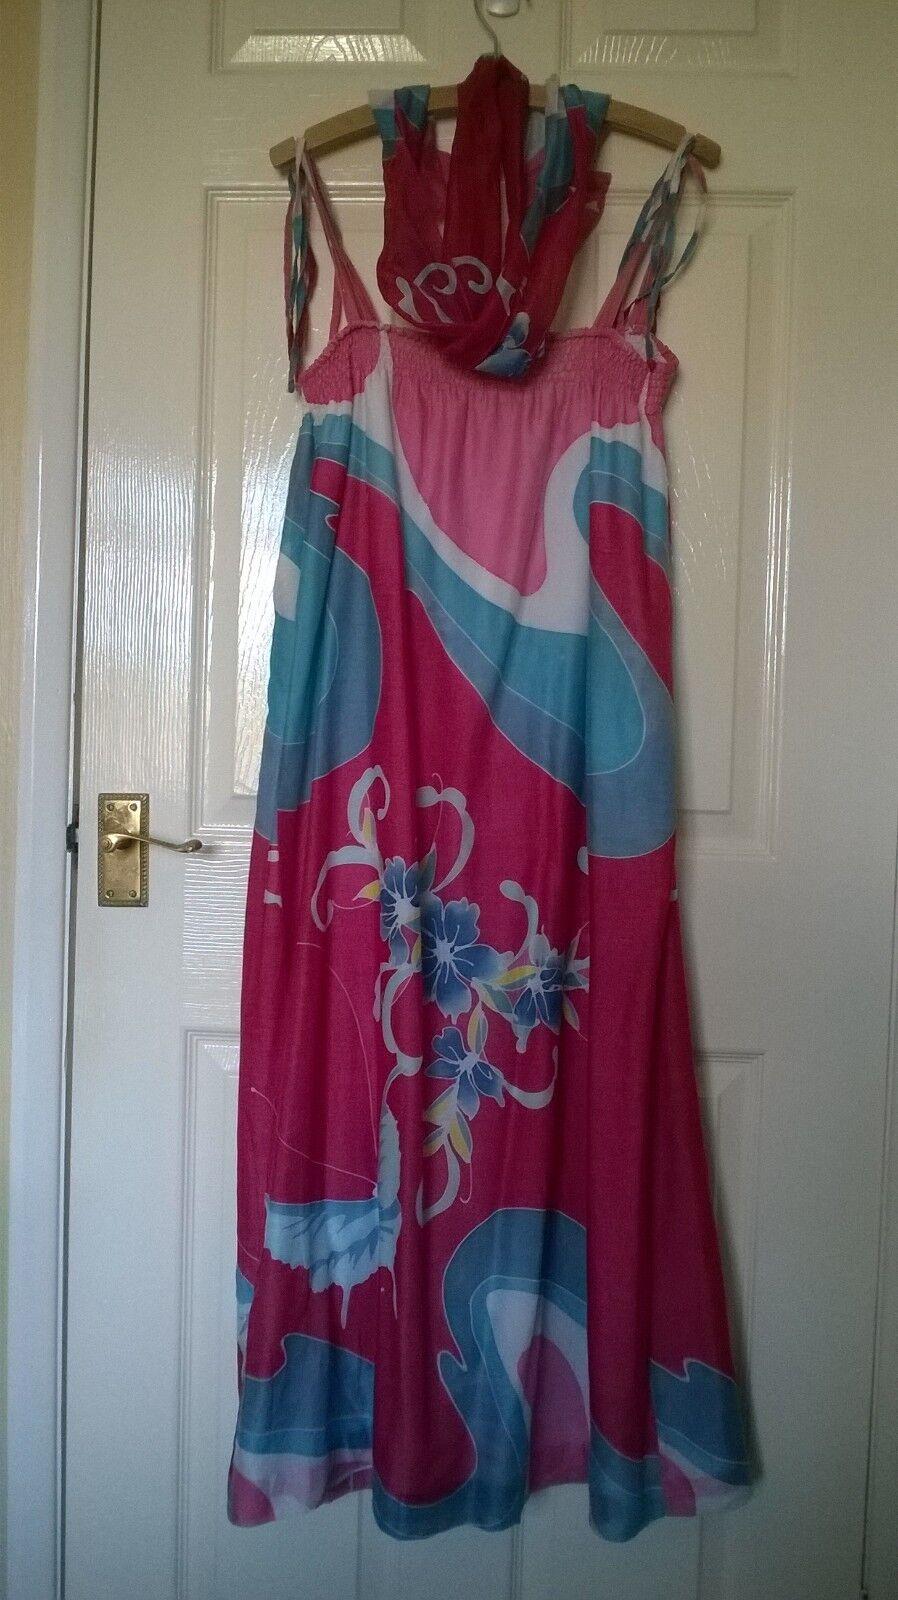 Flair Ladies pink and bluee floral summer beach dress plus tie-belt scarf